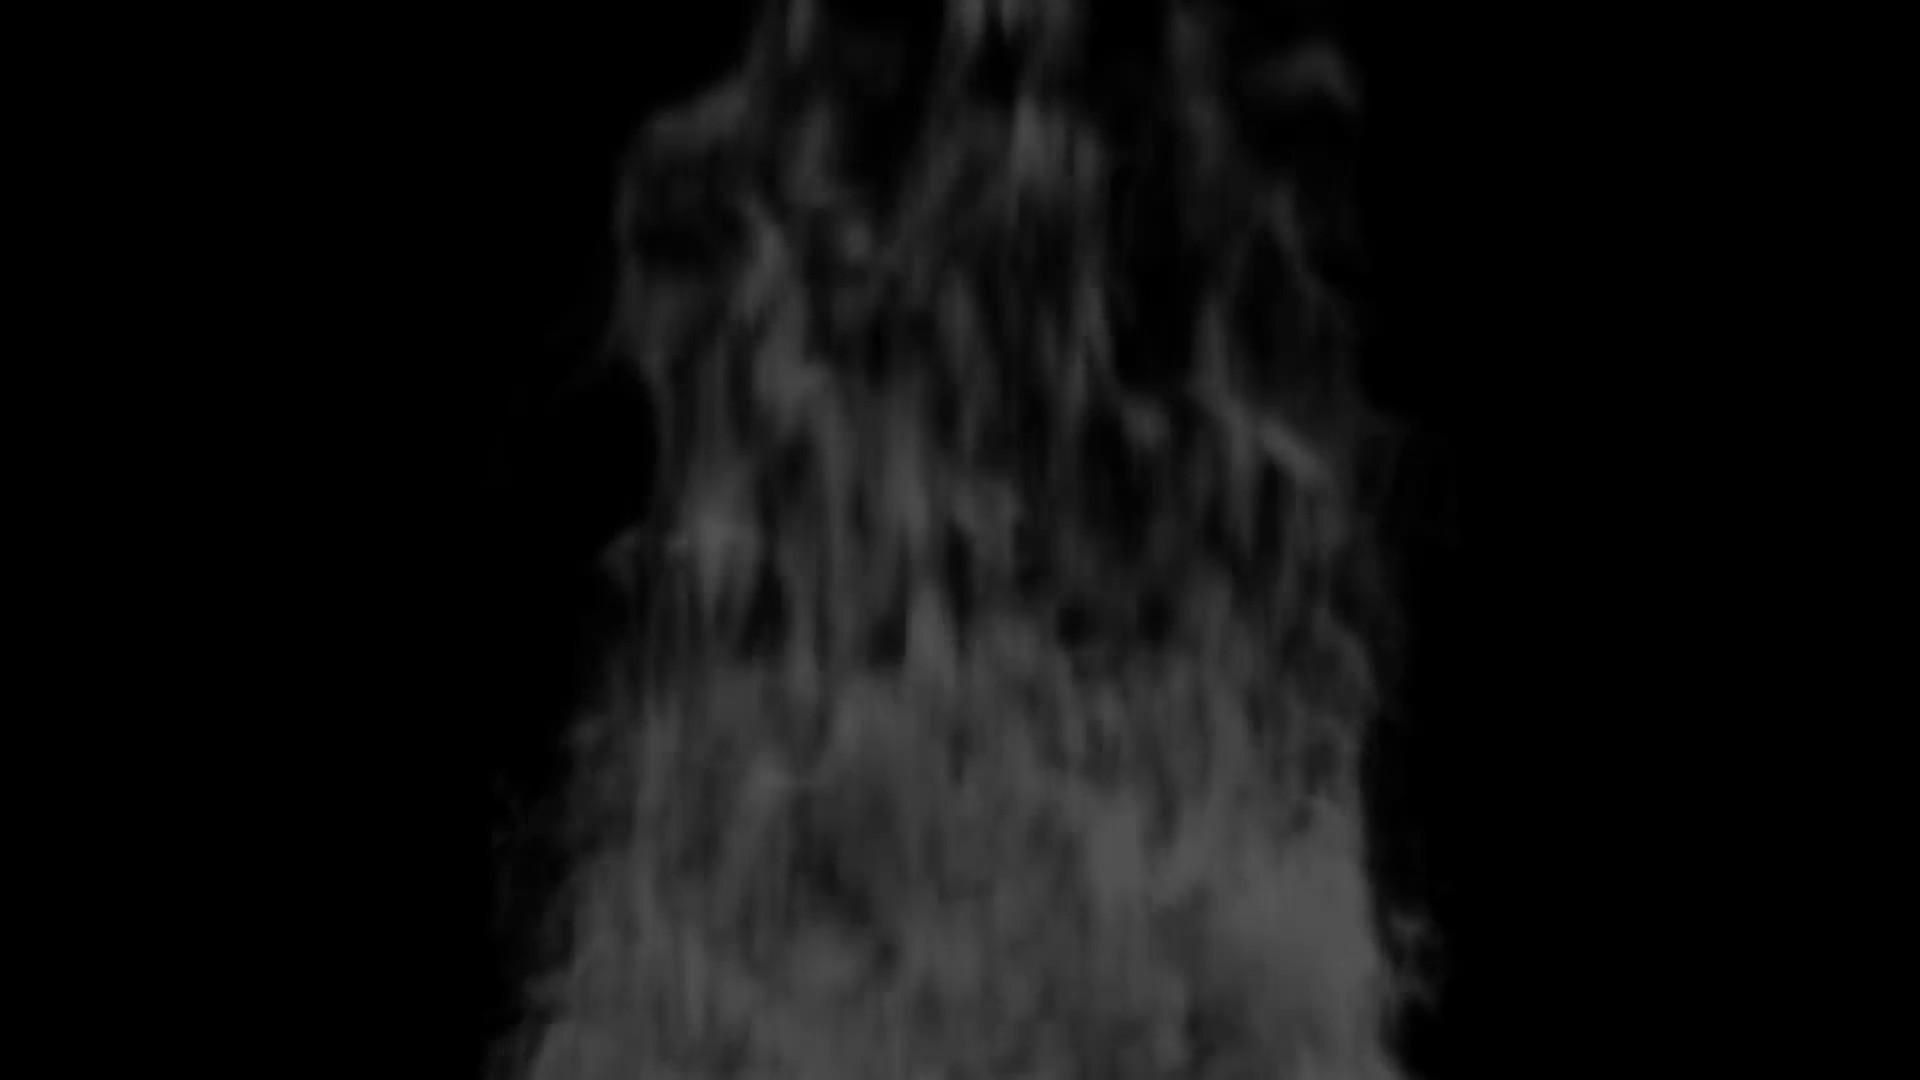 Animated realistic smoke on transparent background 3. Motion Background –  VideoBlocks